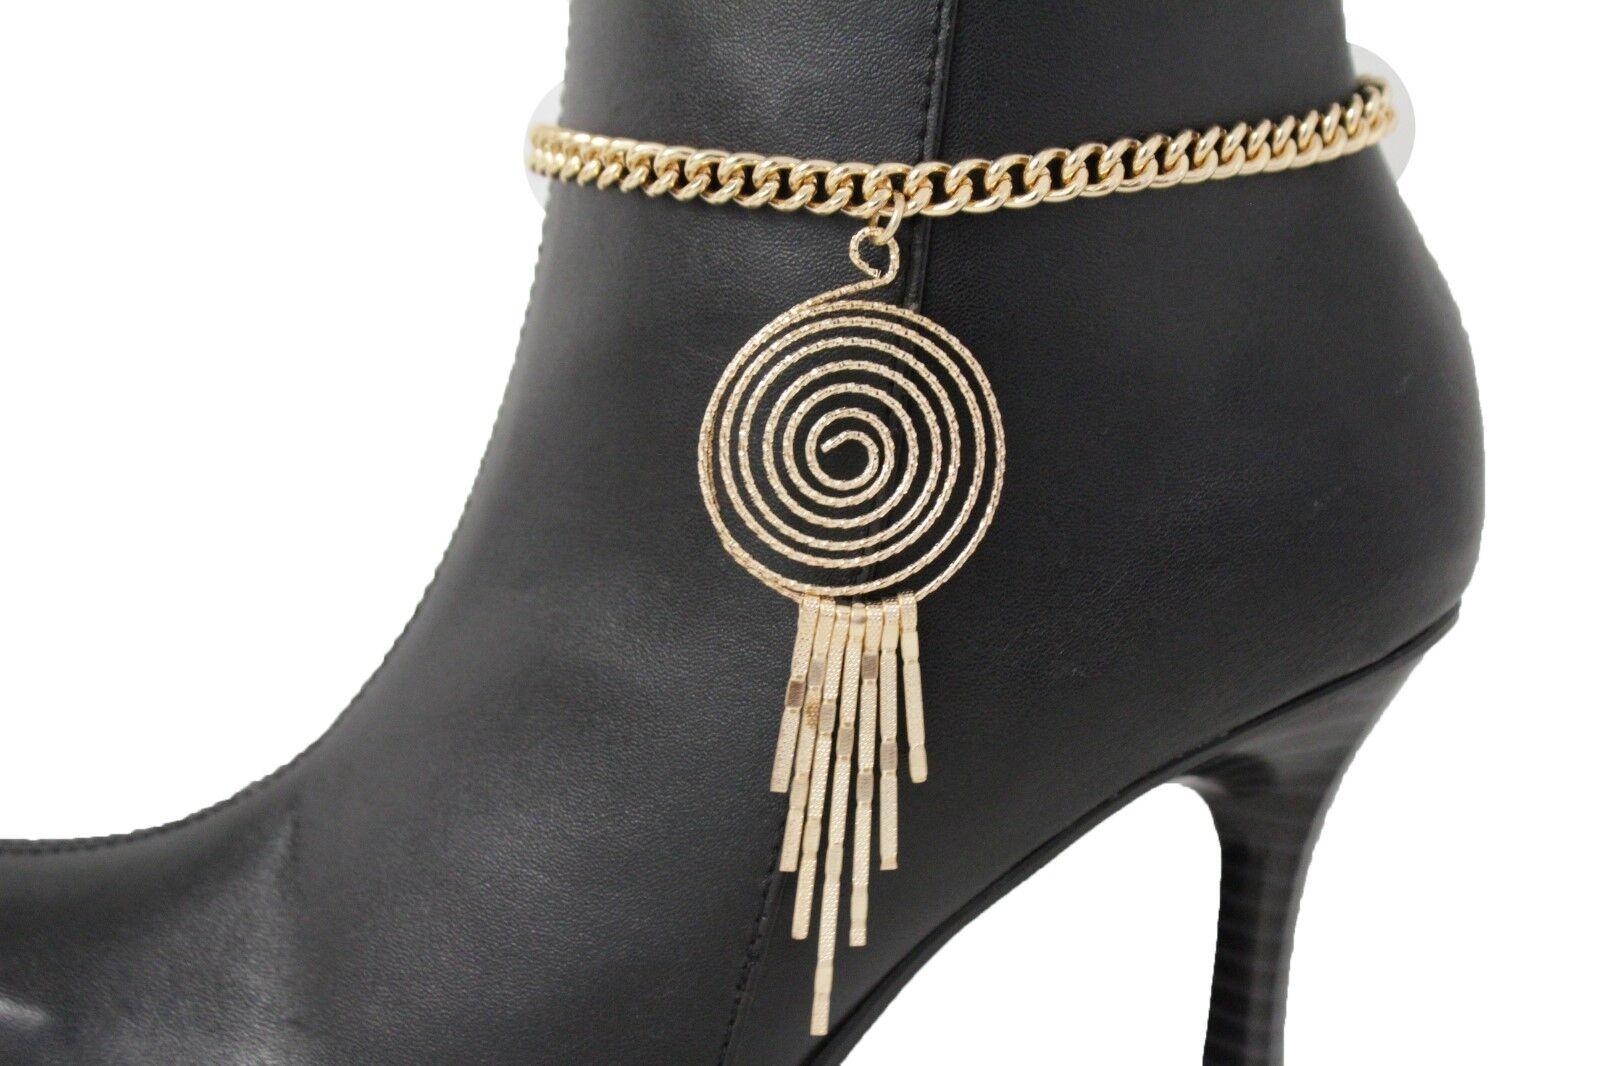 Sexy Women Gold Metal Western Boot Chain Bracelet Swirl Urban Shoe Charm Bling